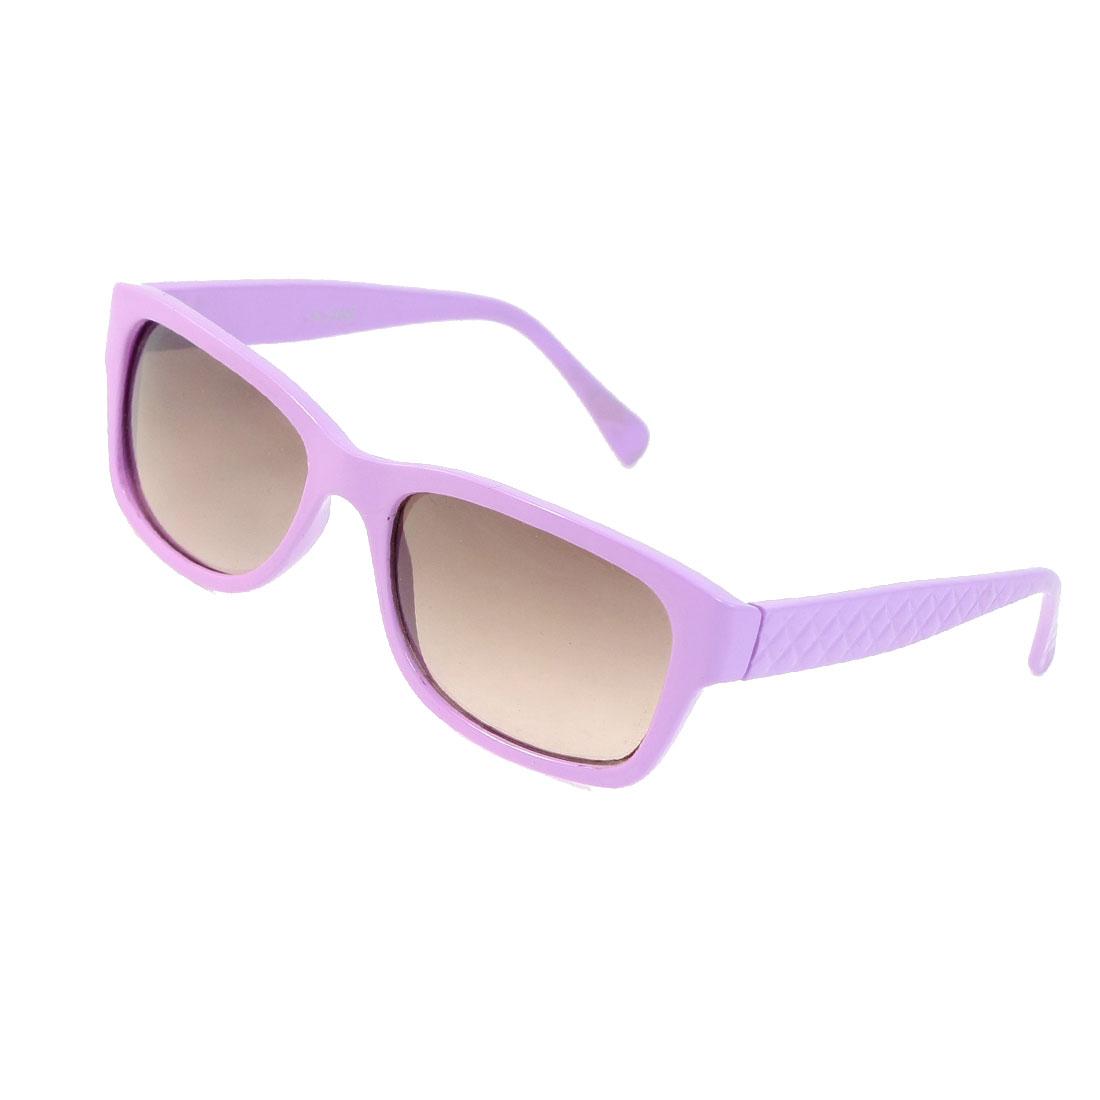 Ladies Rectangle Shape Lens Full Rim Light Purple Plastic Sunglasses Eyewear